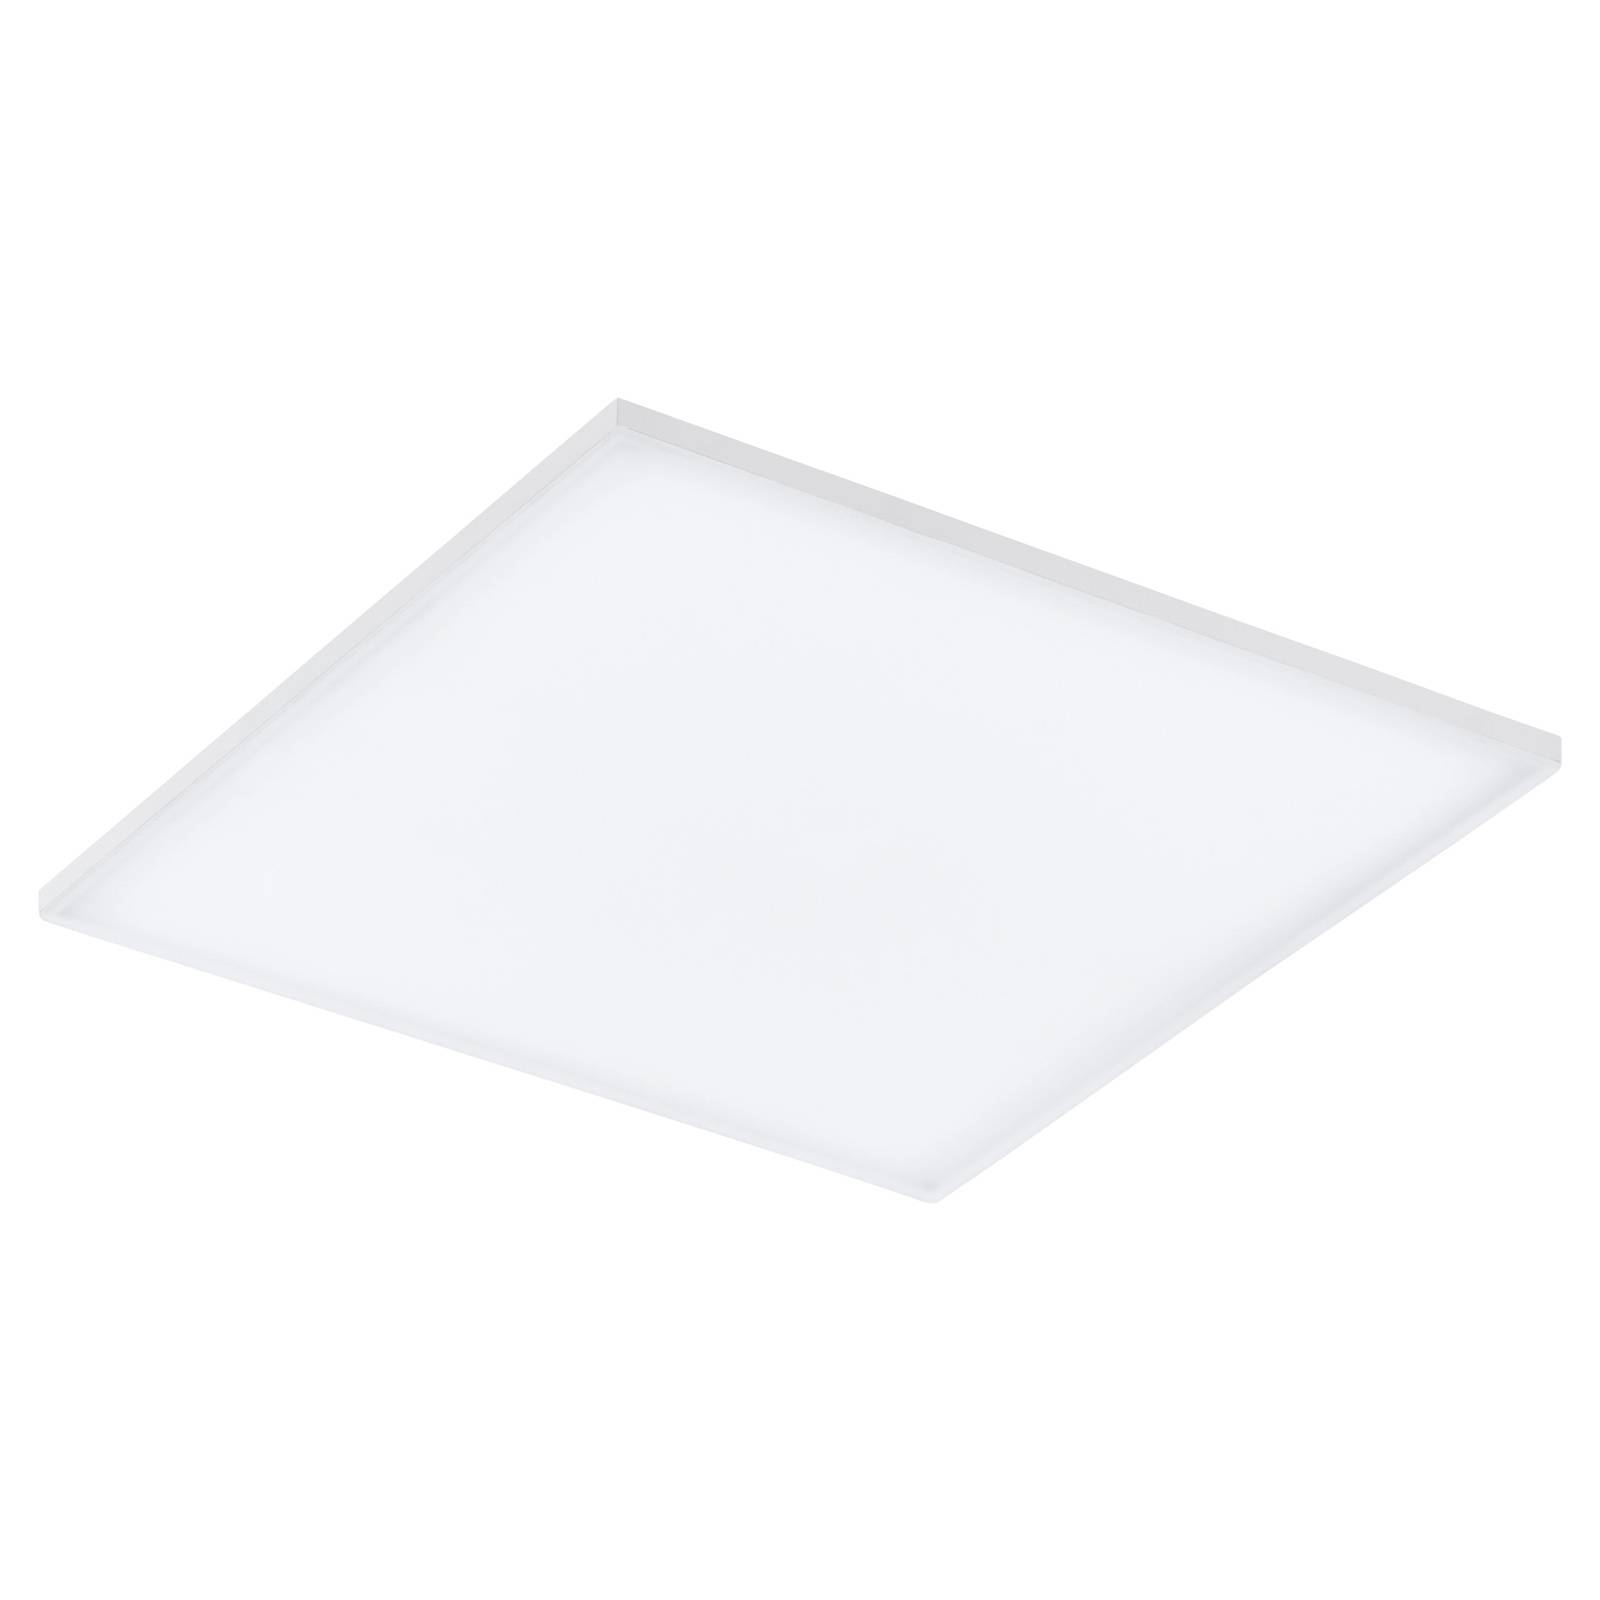 LED plafondlamp Turcona, 59,5 x 59,5 cm